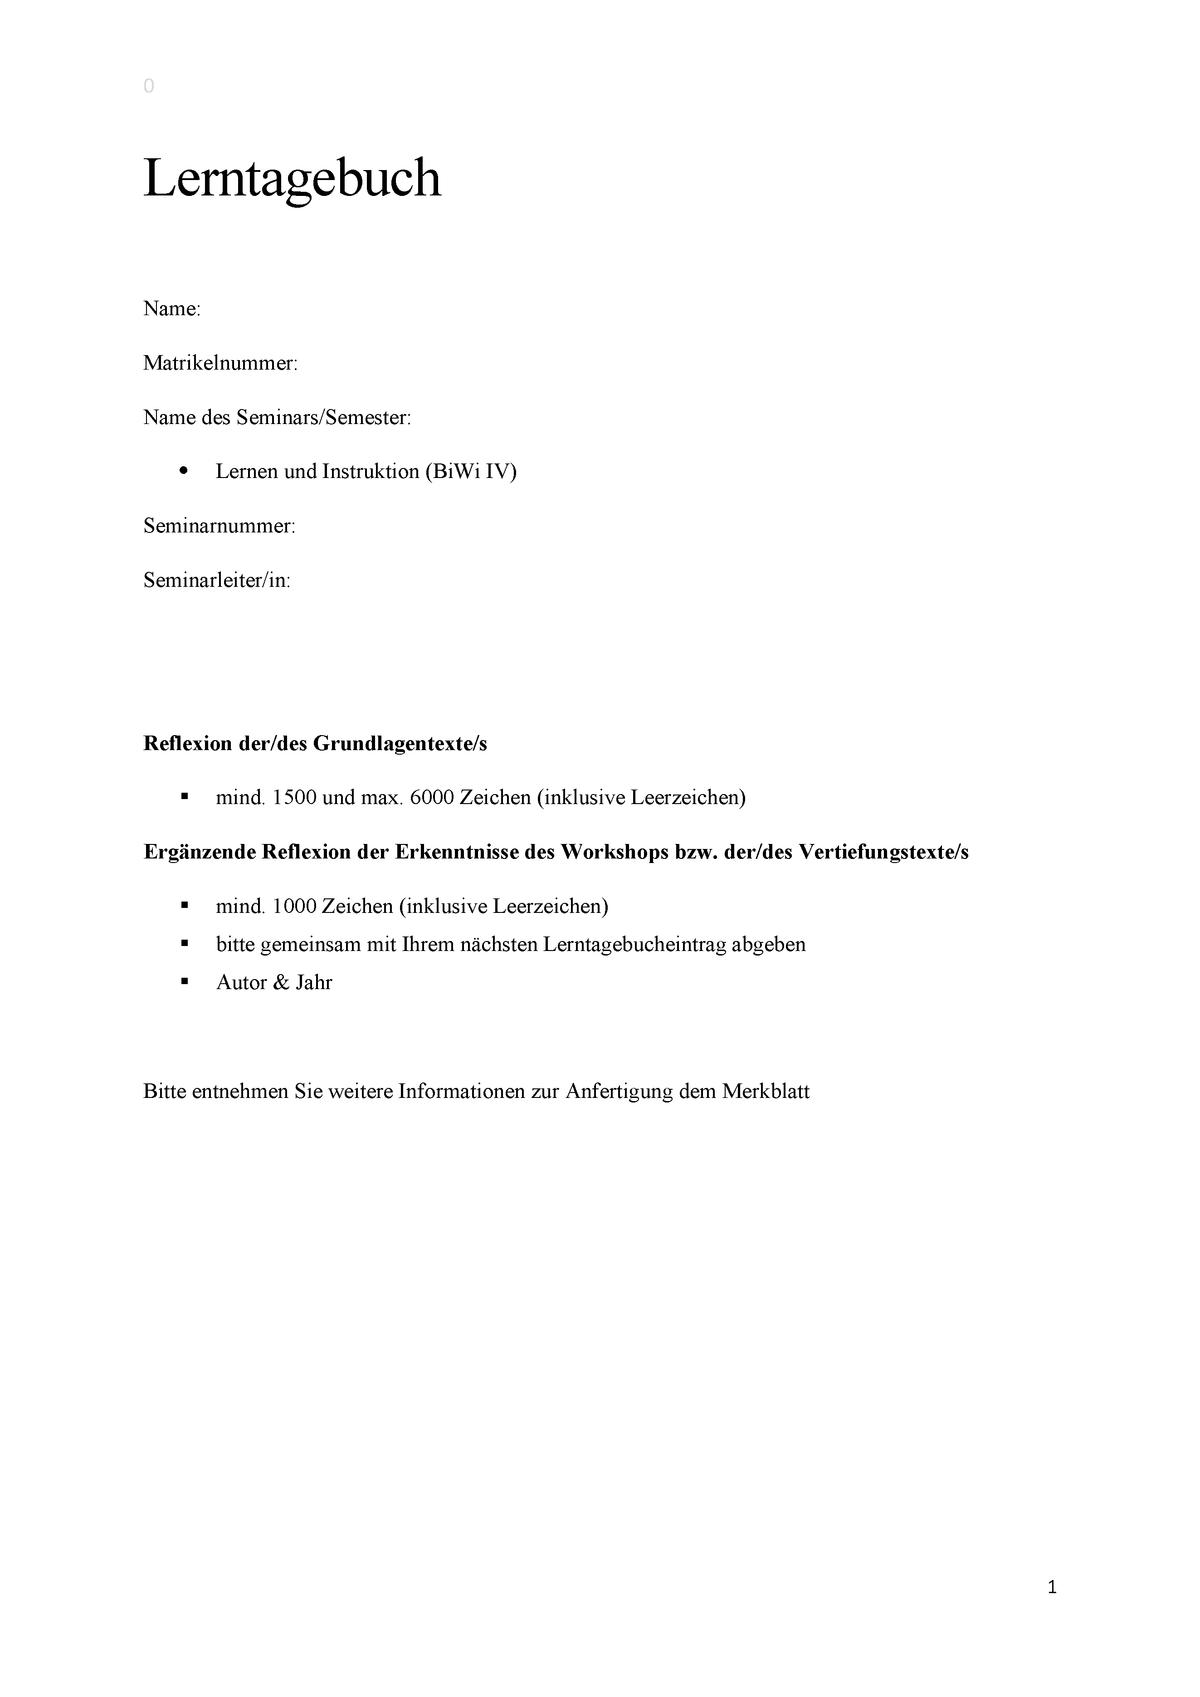 Lerntagebuch Bi Wi 4 Beispiel Studocu